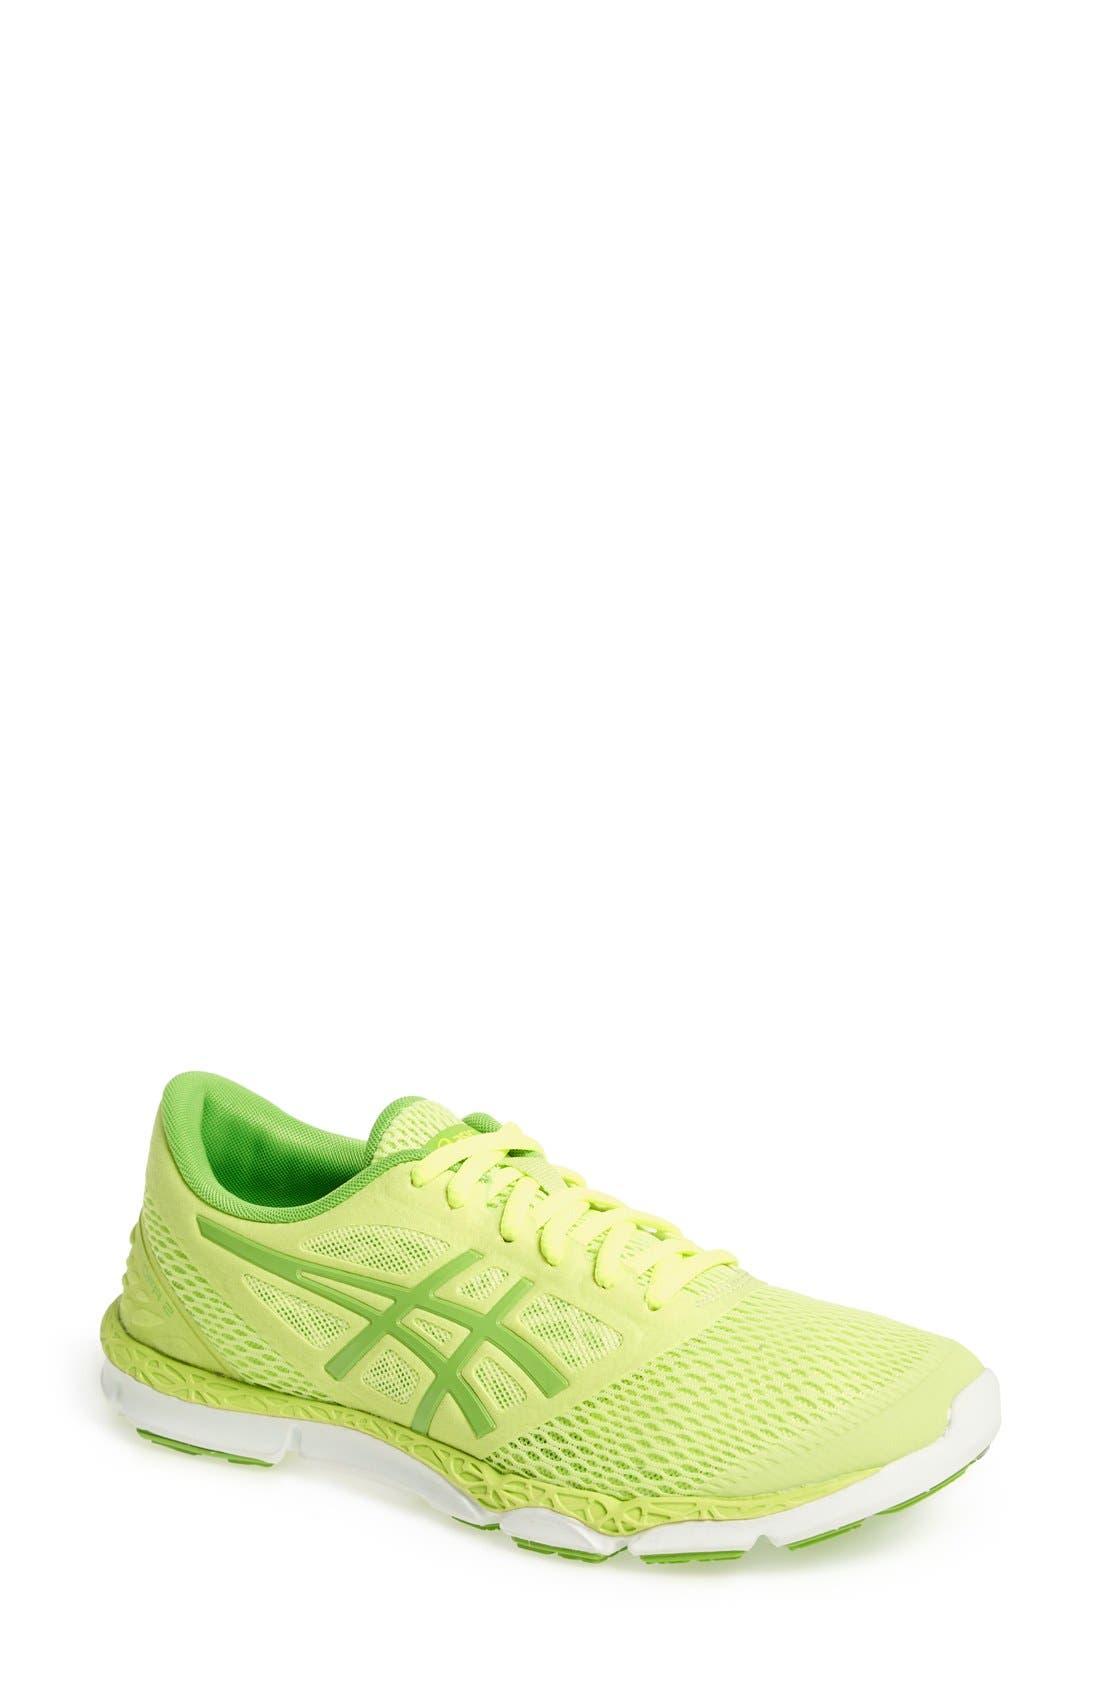 Main Image - ASICS® '33 DFA 2' Running Shoe (Women)